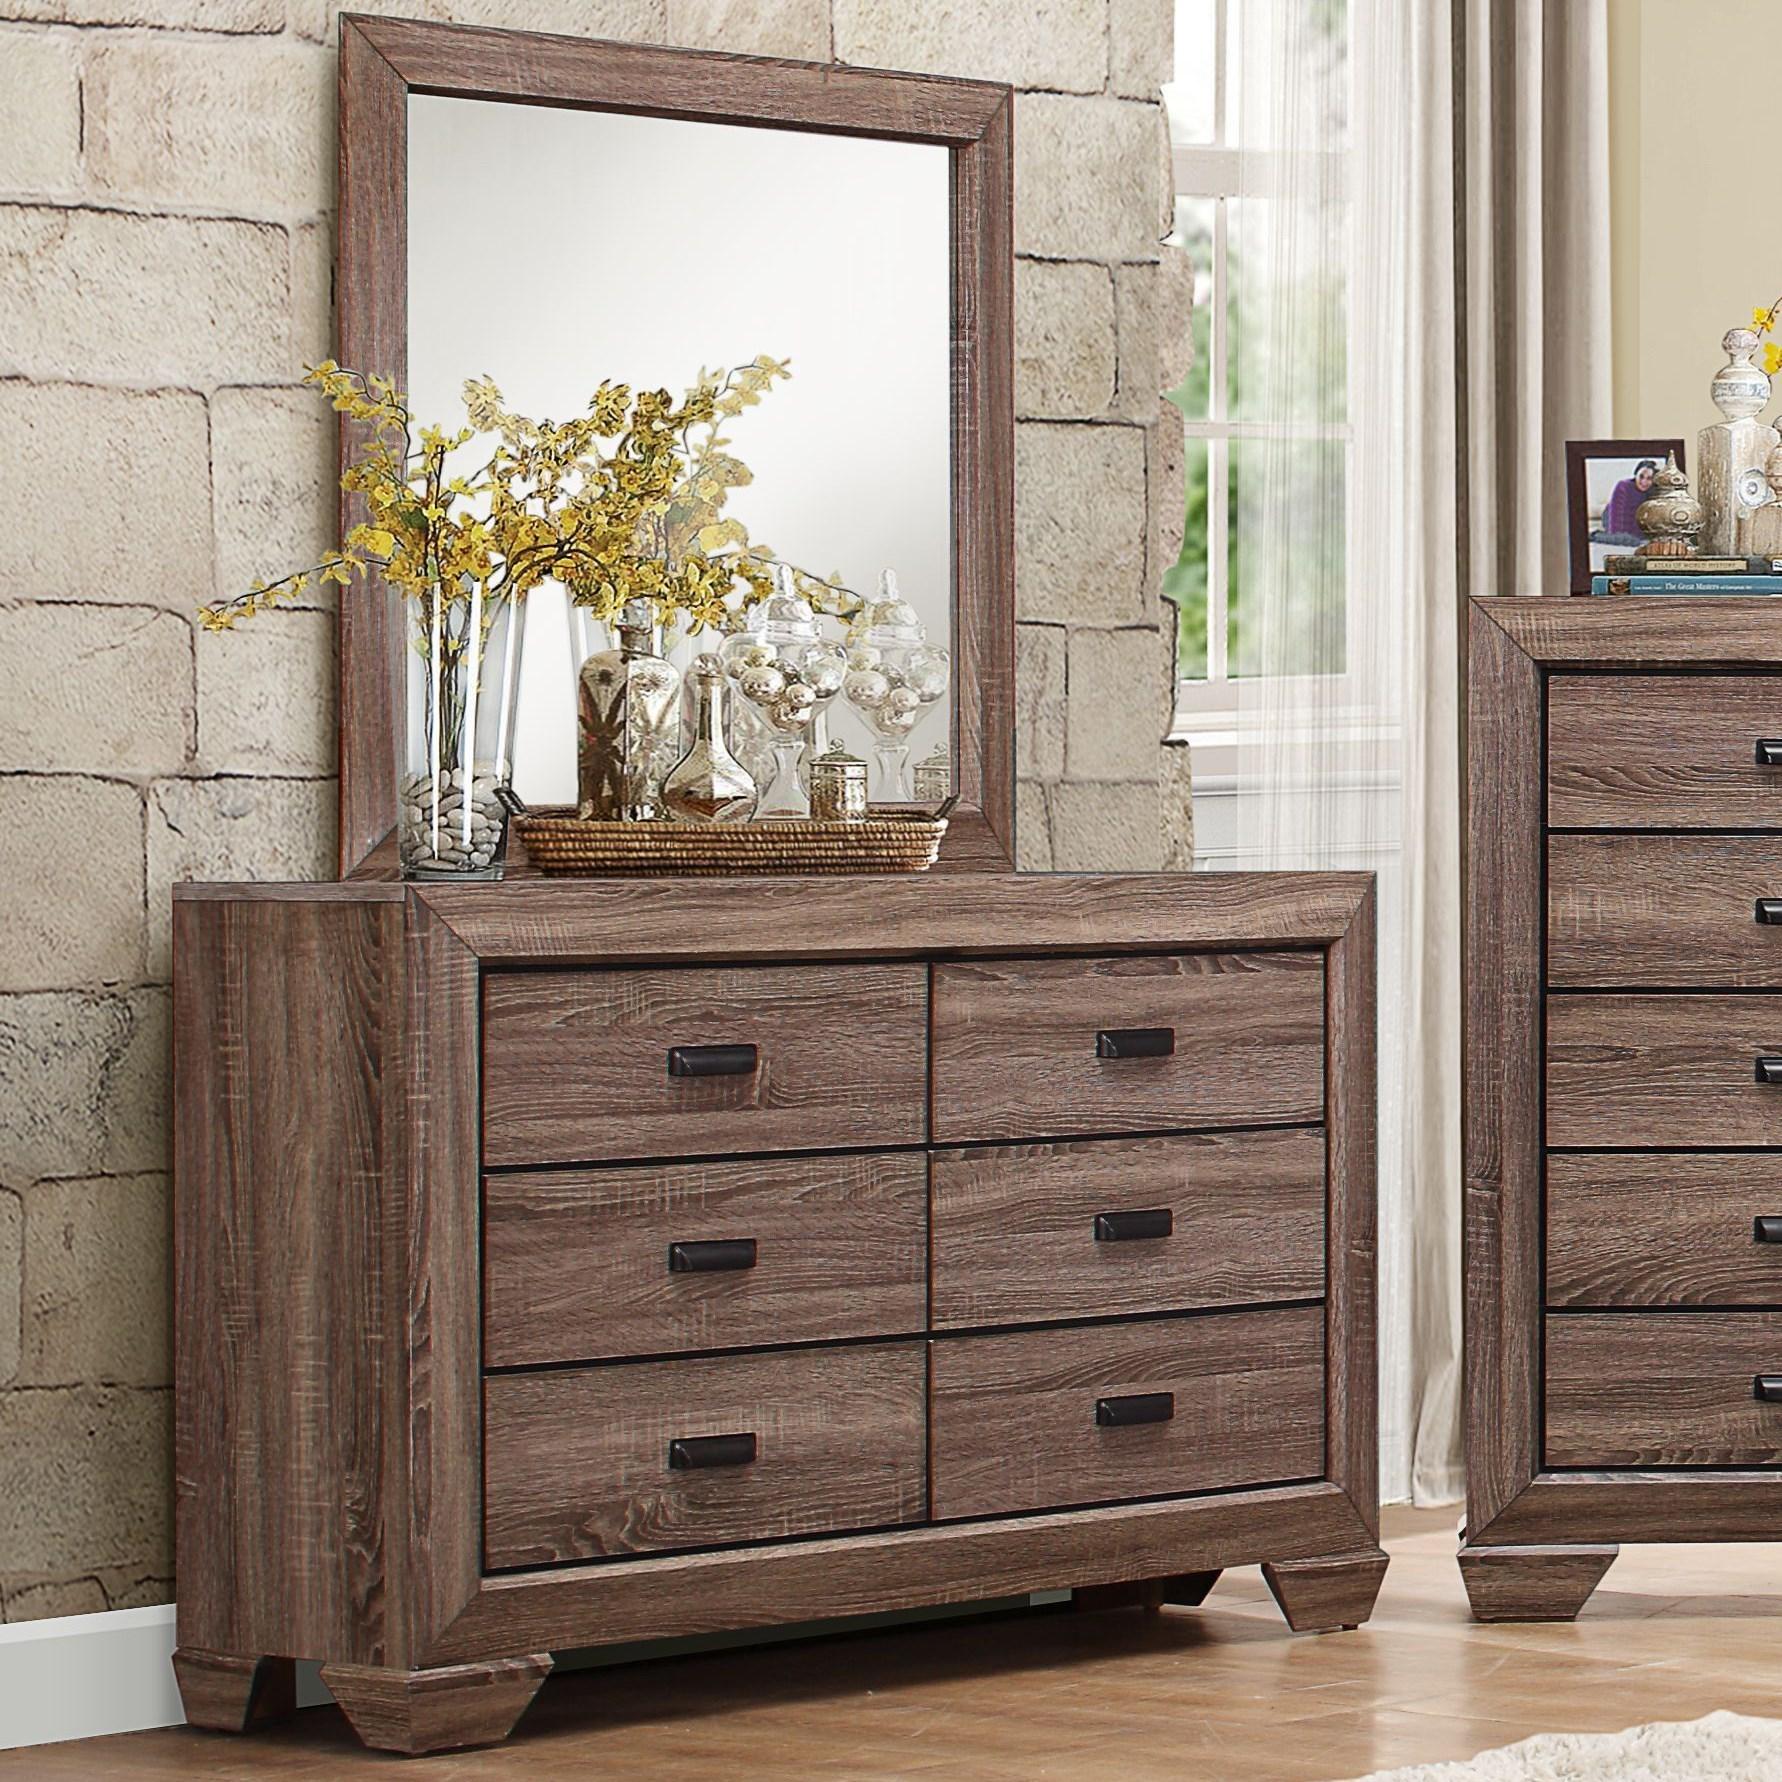 Beechnut Modern 6-Drawer Dresser and Mirror by Homelegance at Carolina Direct